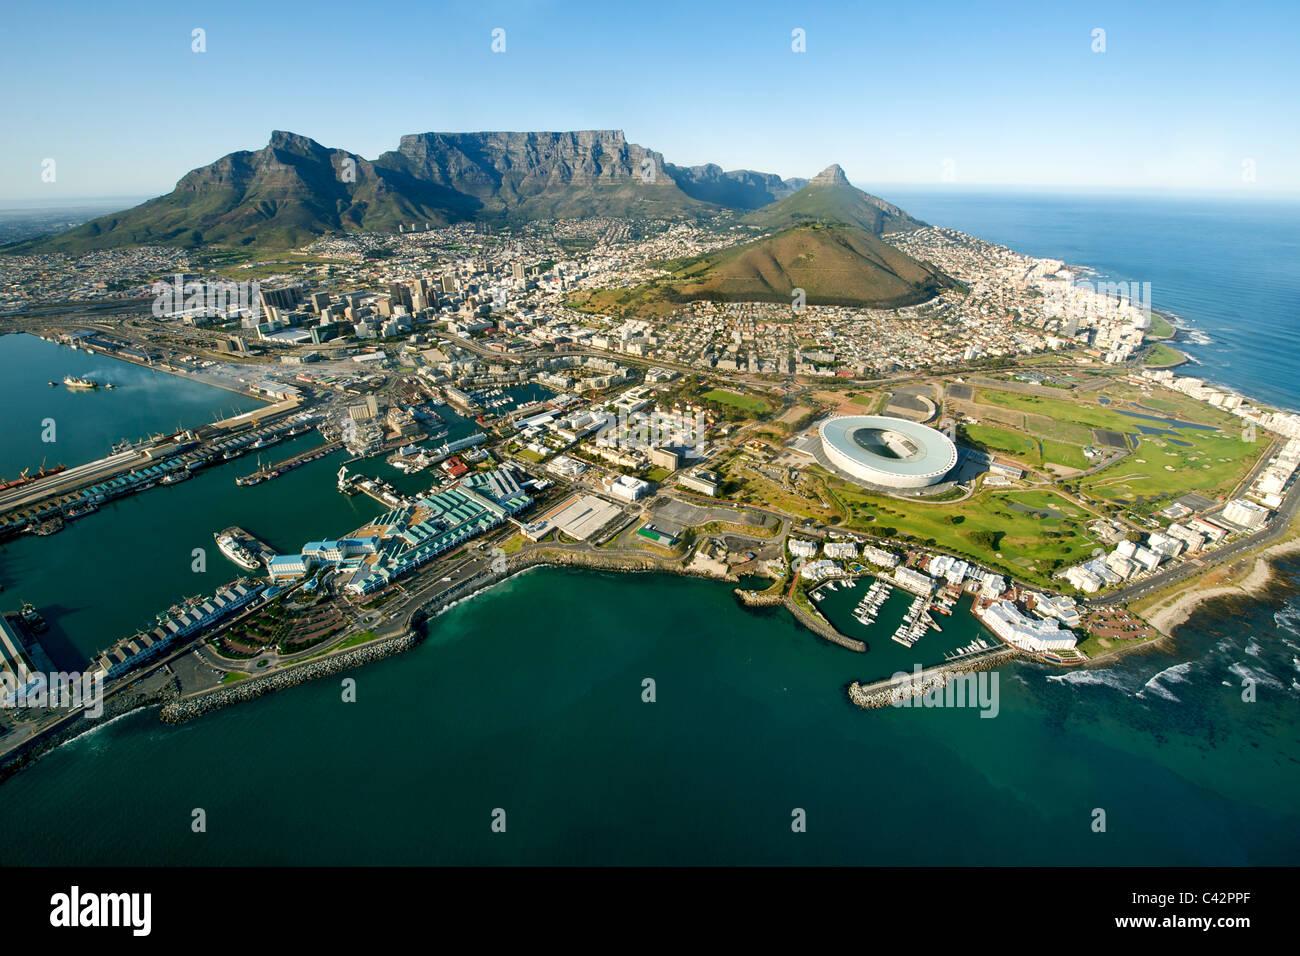 Vista aérea de la ciudad de Cape Town, Sudáfrica. Imagen De Stock